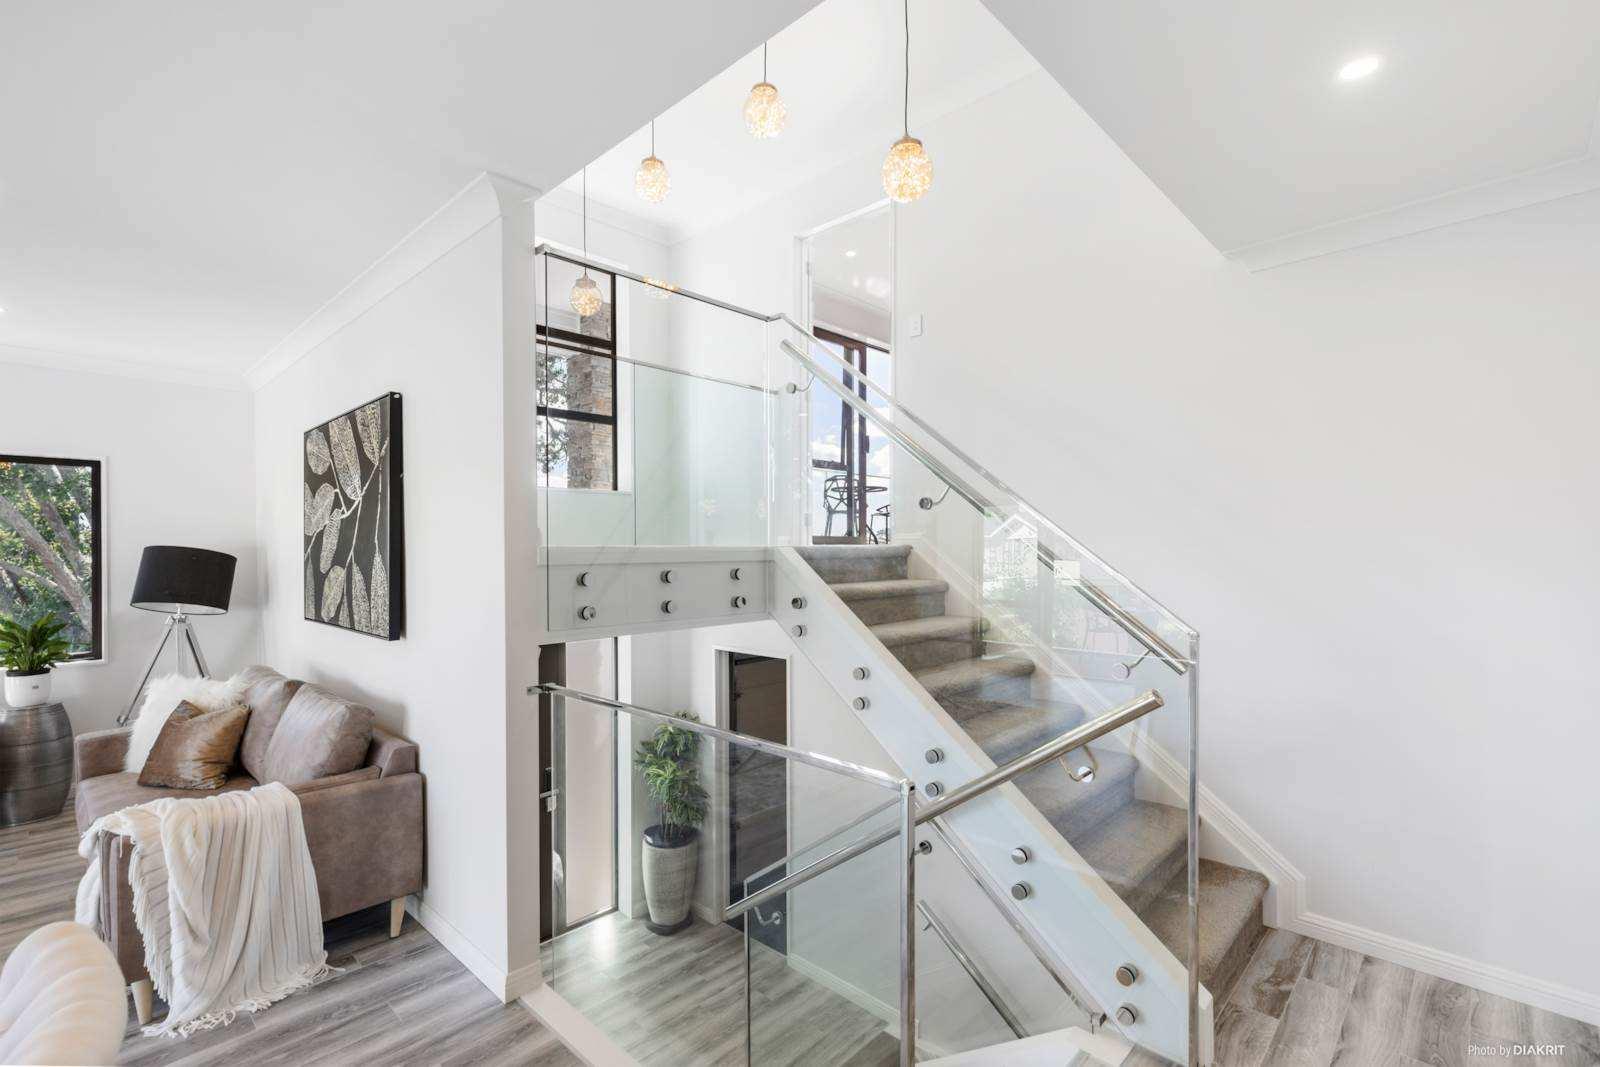 Blockhouse Bay 5房 崭新错层别墅 功能性&舒适性兼备 饱览公园美景 学区与配套极其完善 品味精致现代人生 Brand New, Spacious, Trendy & Affordable!